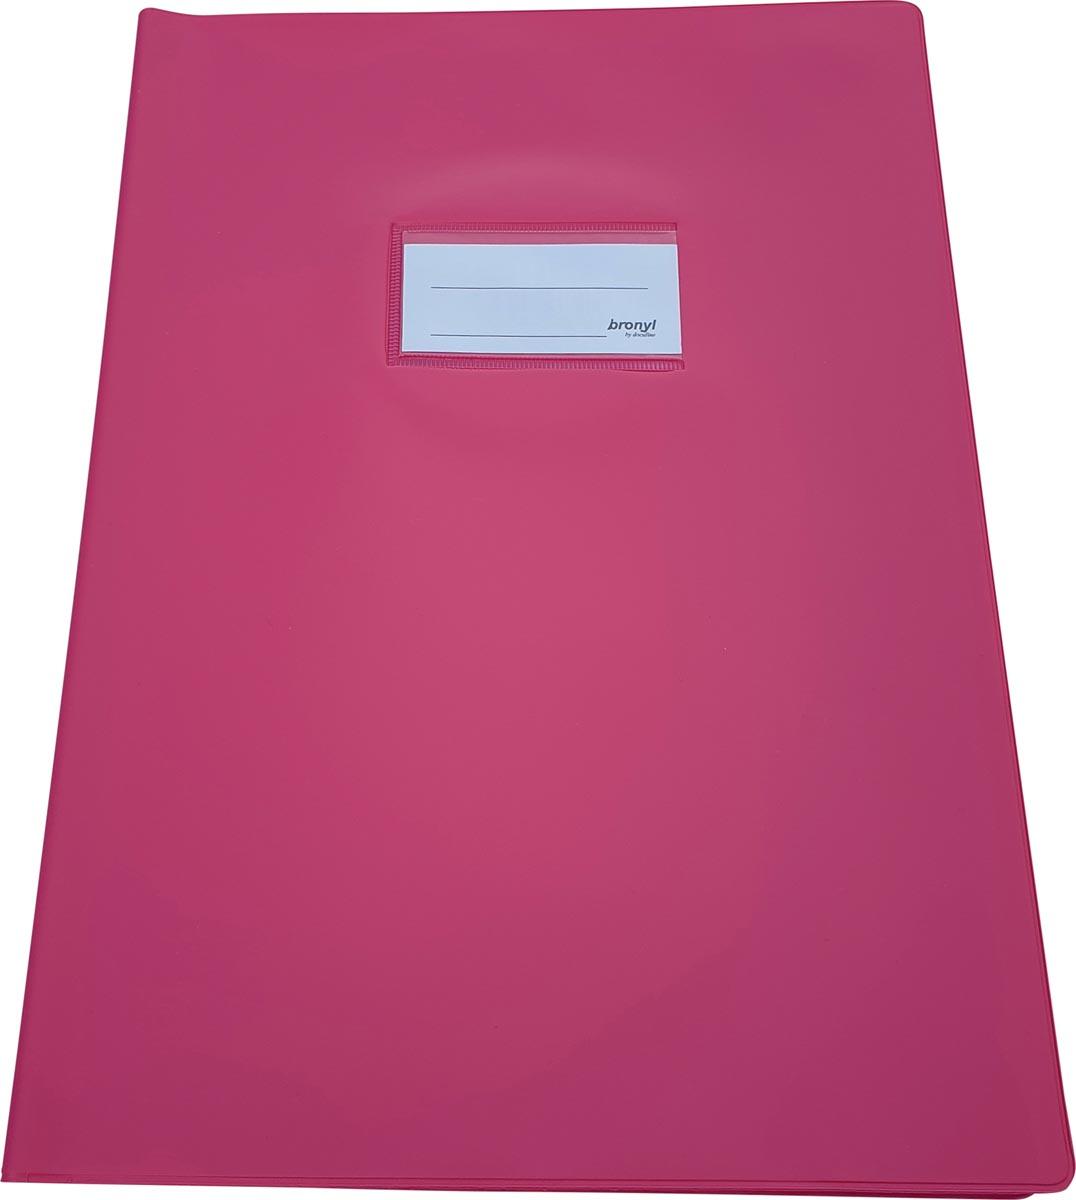 Bronyl schriftomslag ft 21 x 29,7 cm (A4), roze